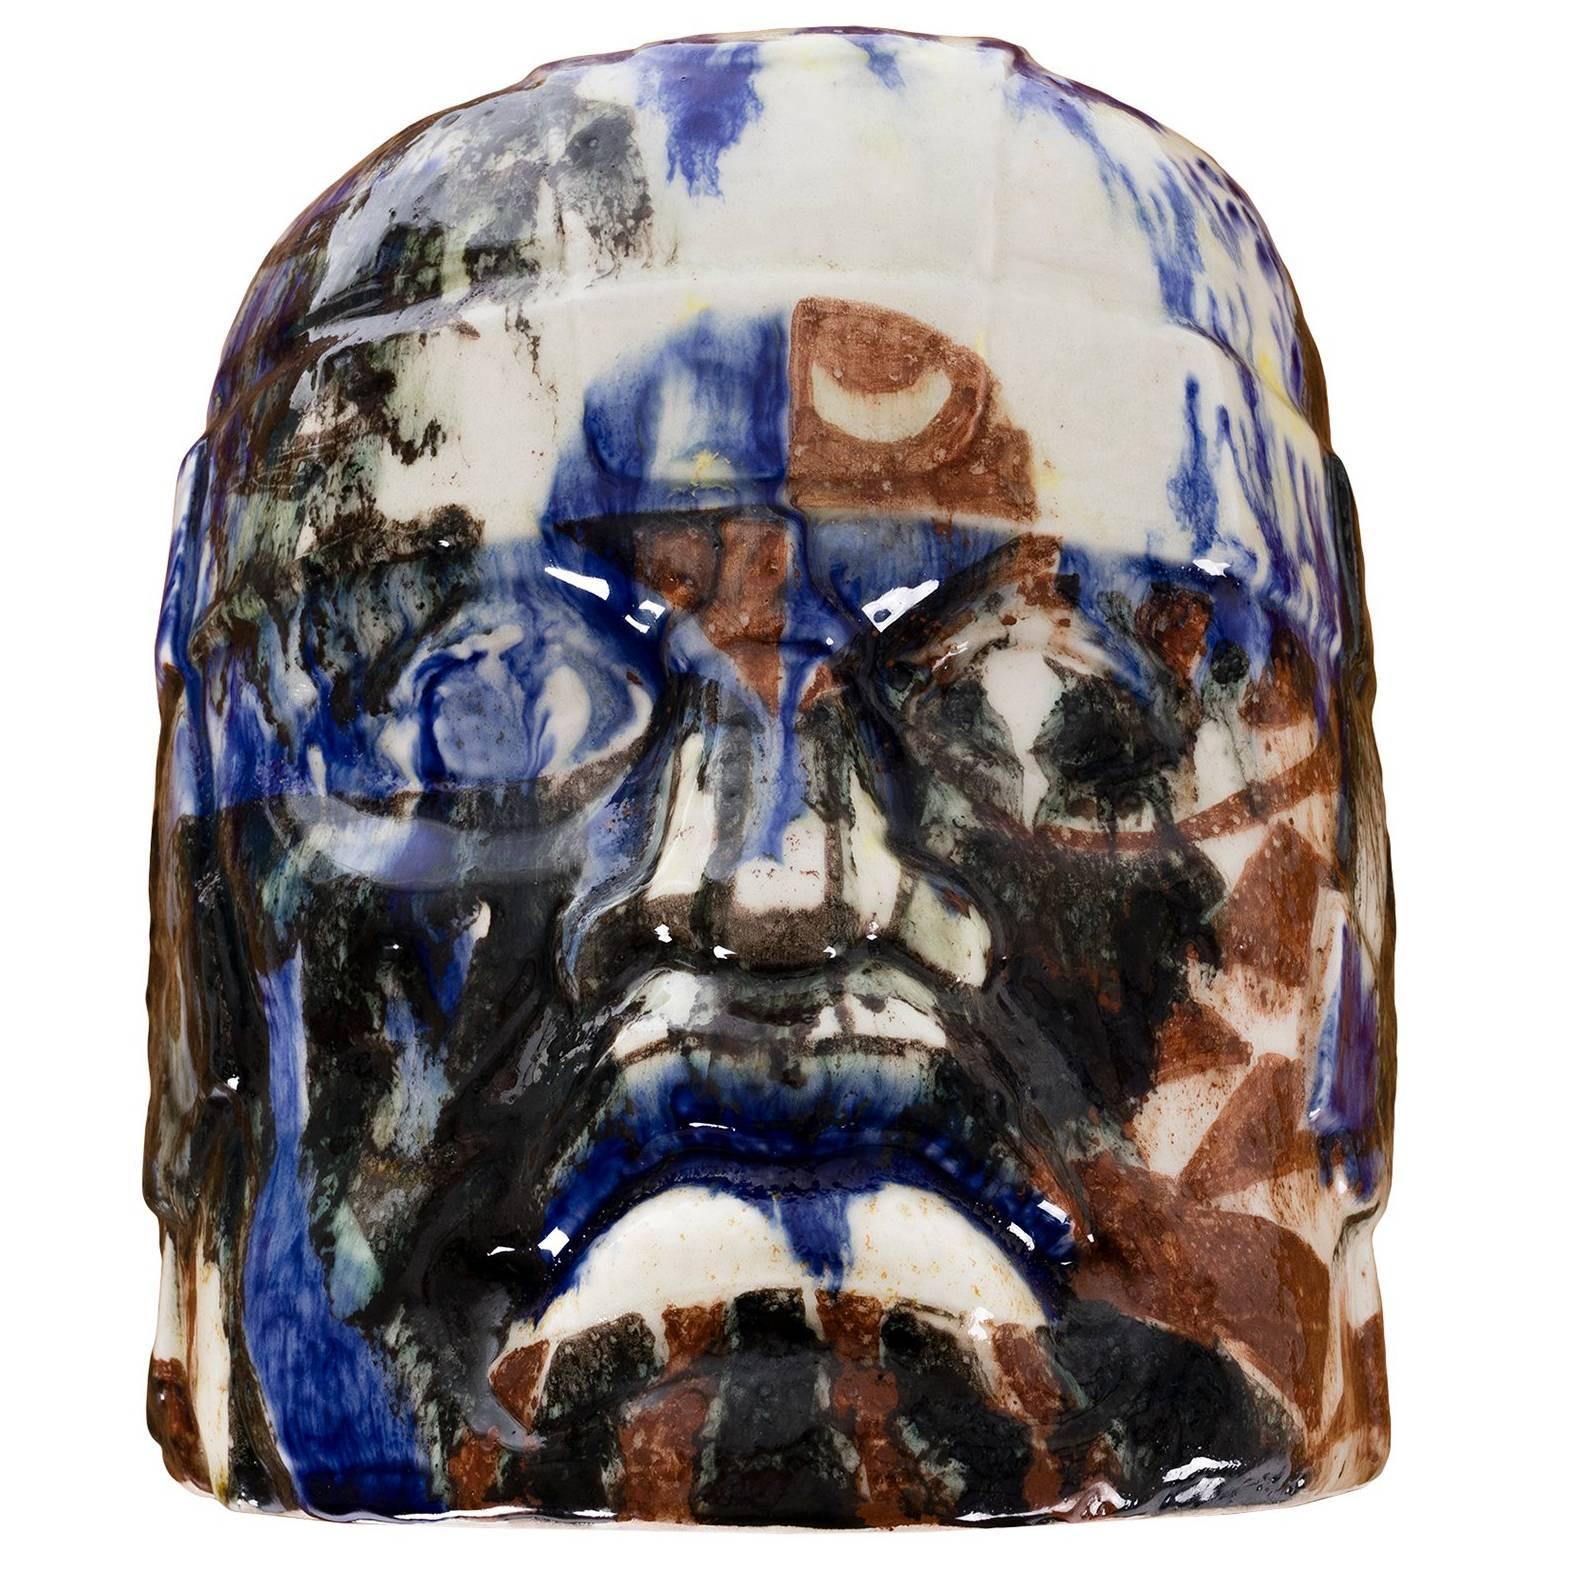 Olmec Head by Eric Ledoux